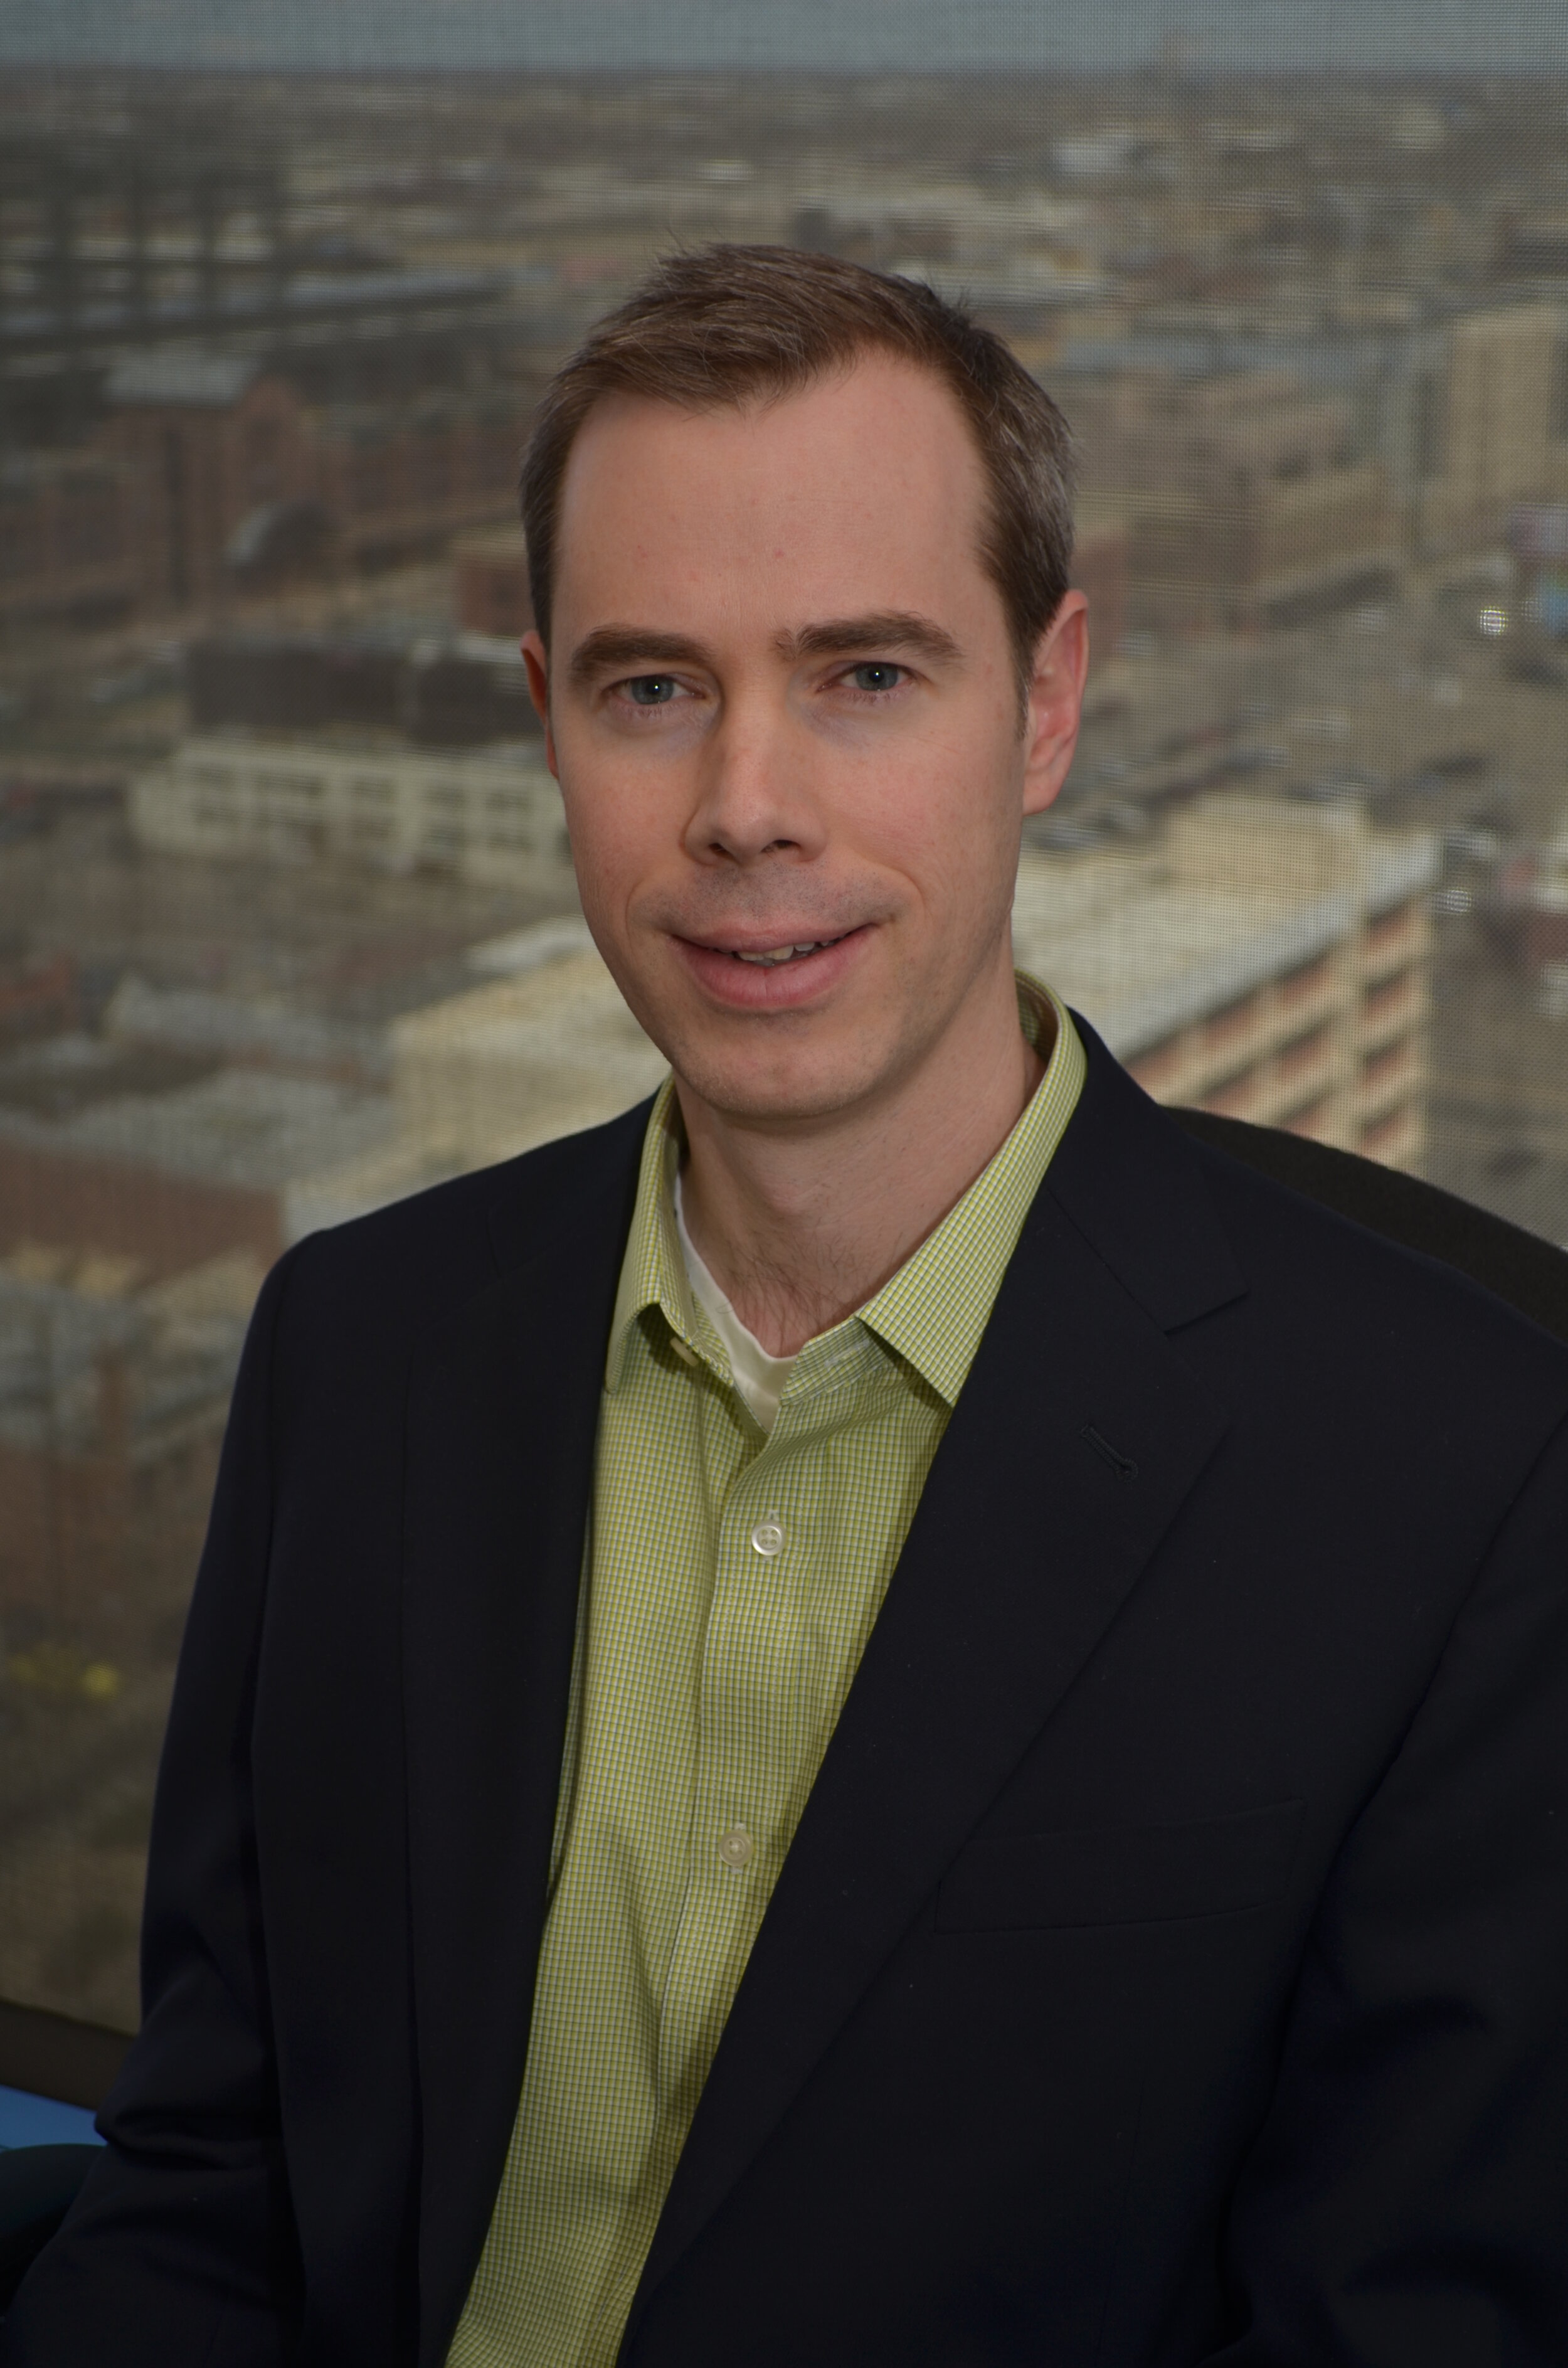 Jack Ihle, Director, Regulatory & Strategic Analysis, Xcel Energy